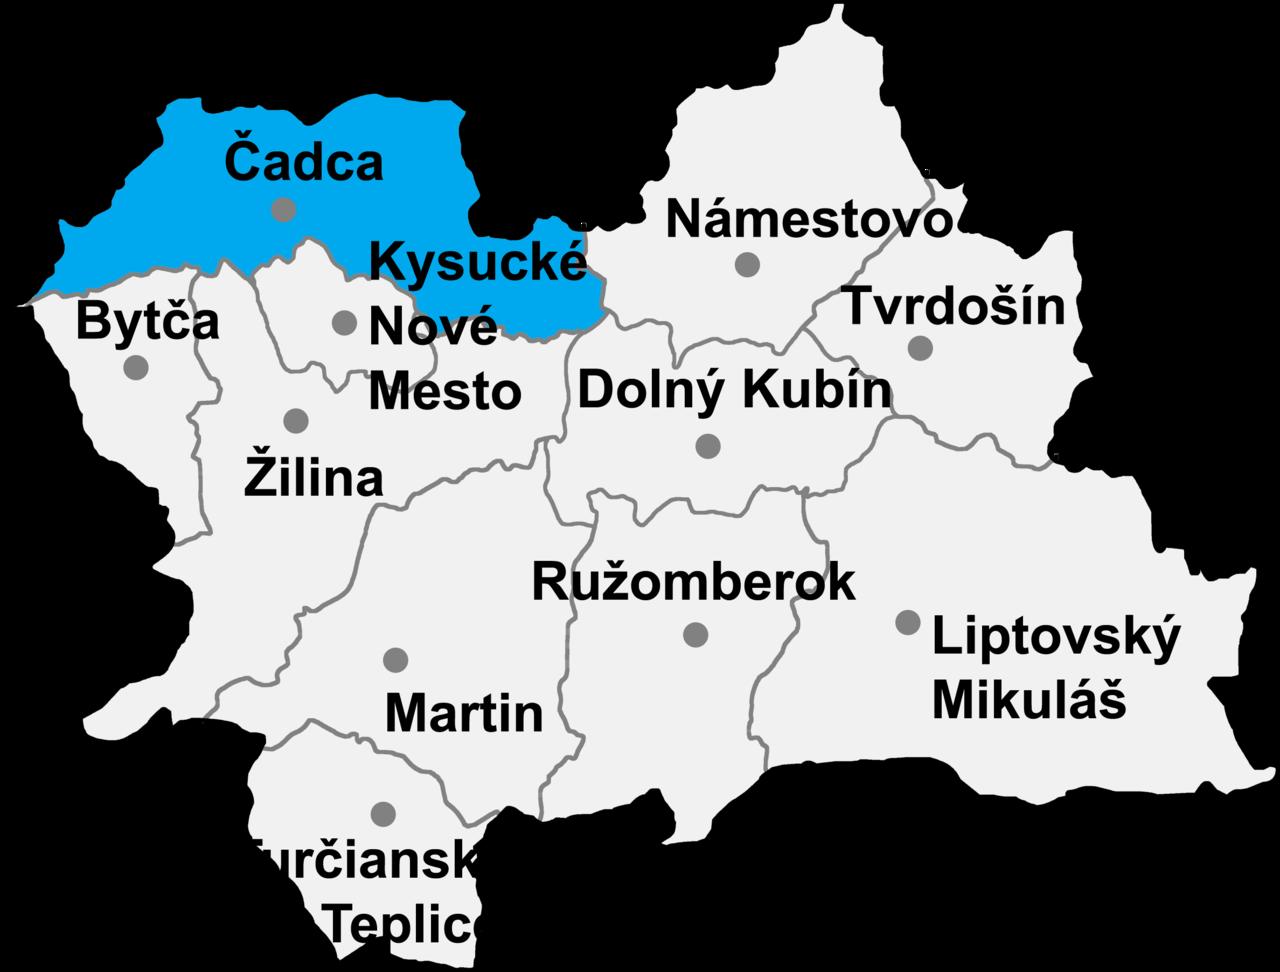 Okres Čadca in der Slowakei